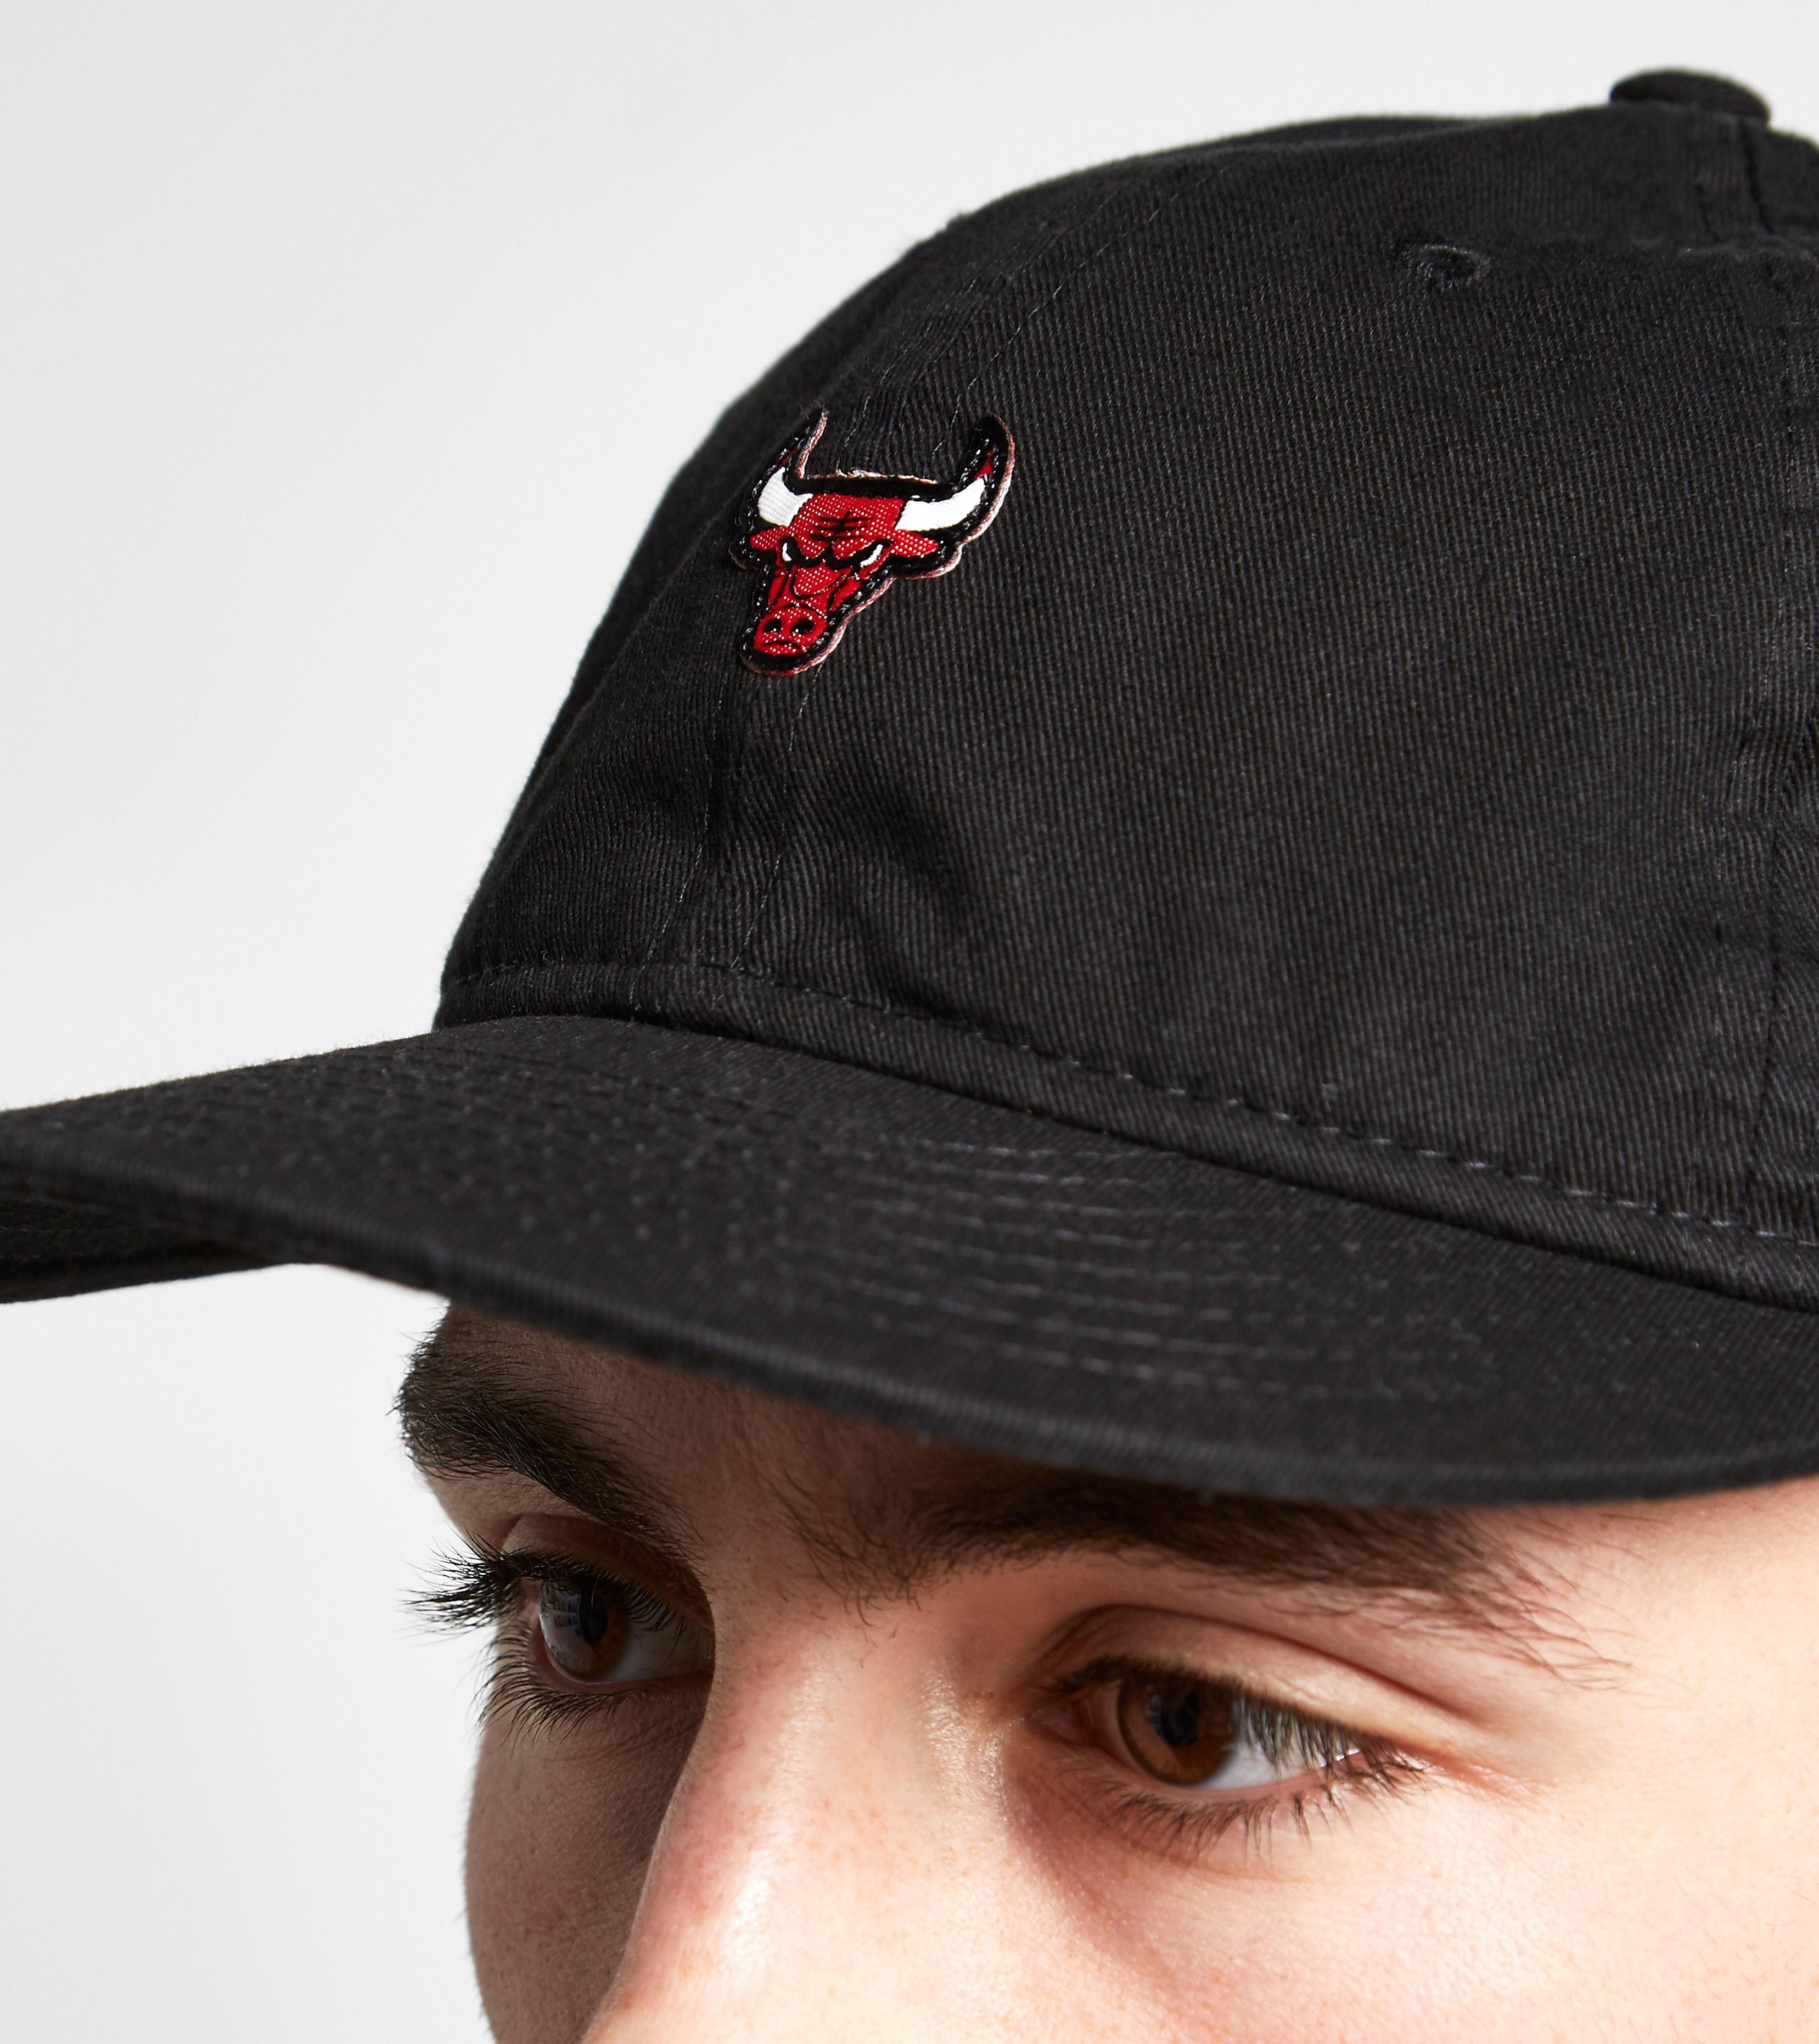 New Era 9FIFTY Bulls Strapback Cap - size? Exclusive